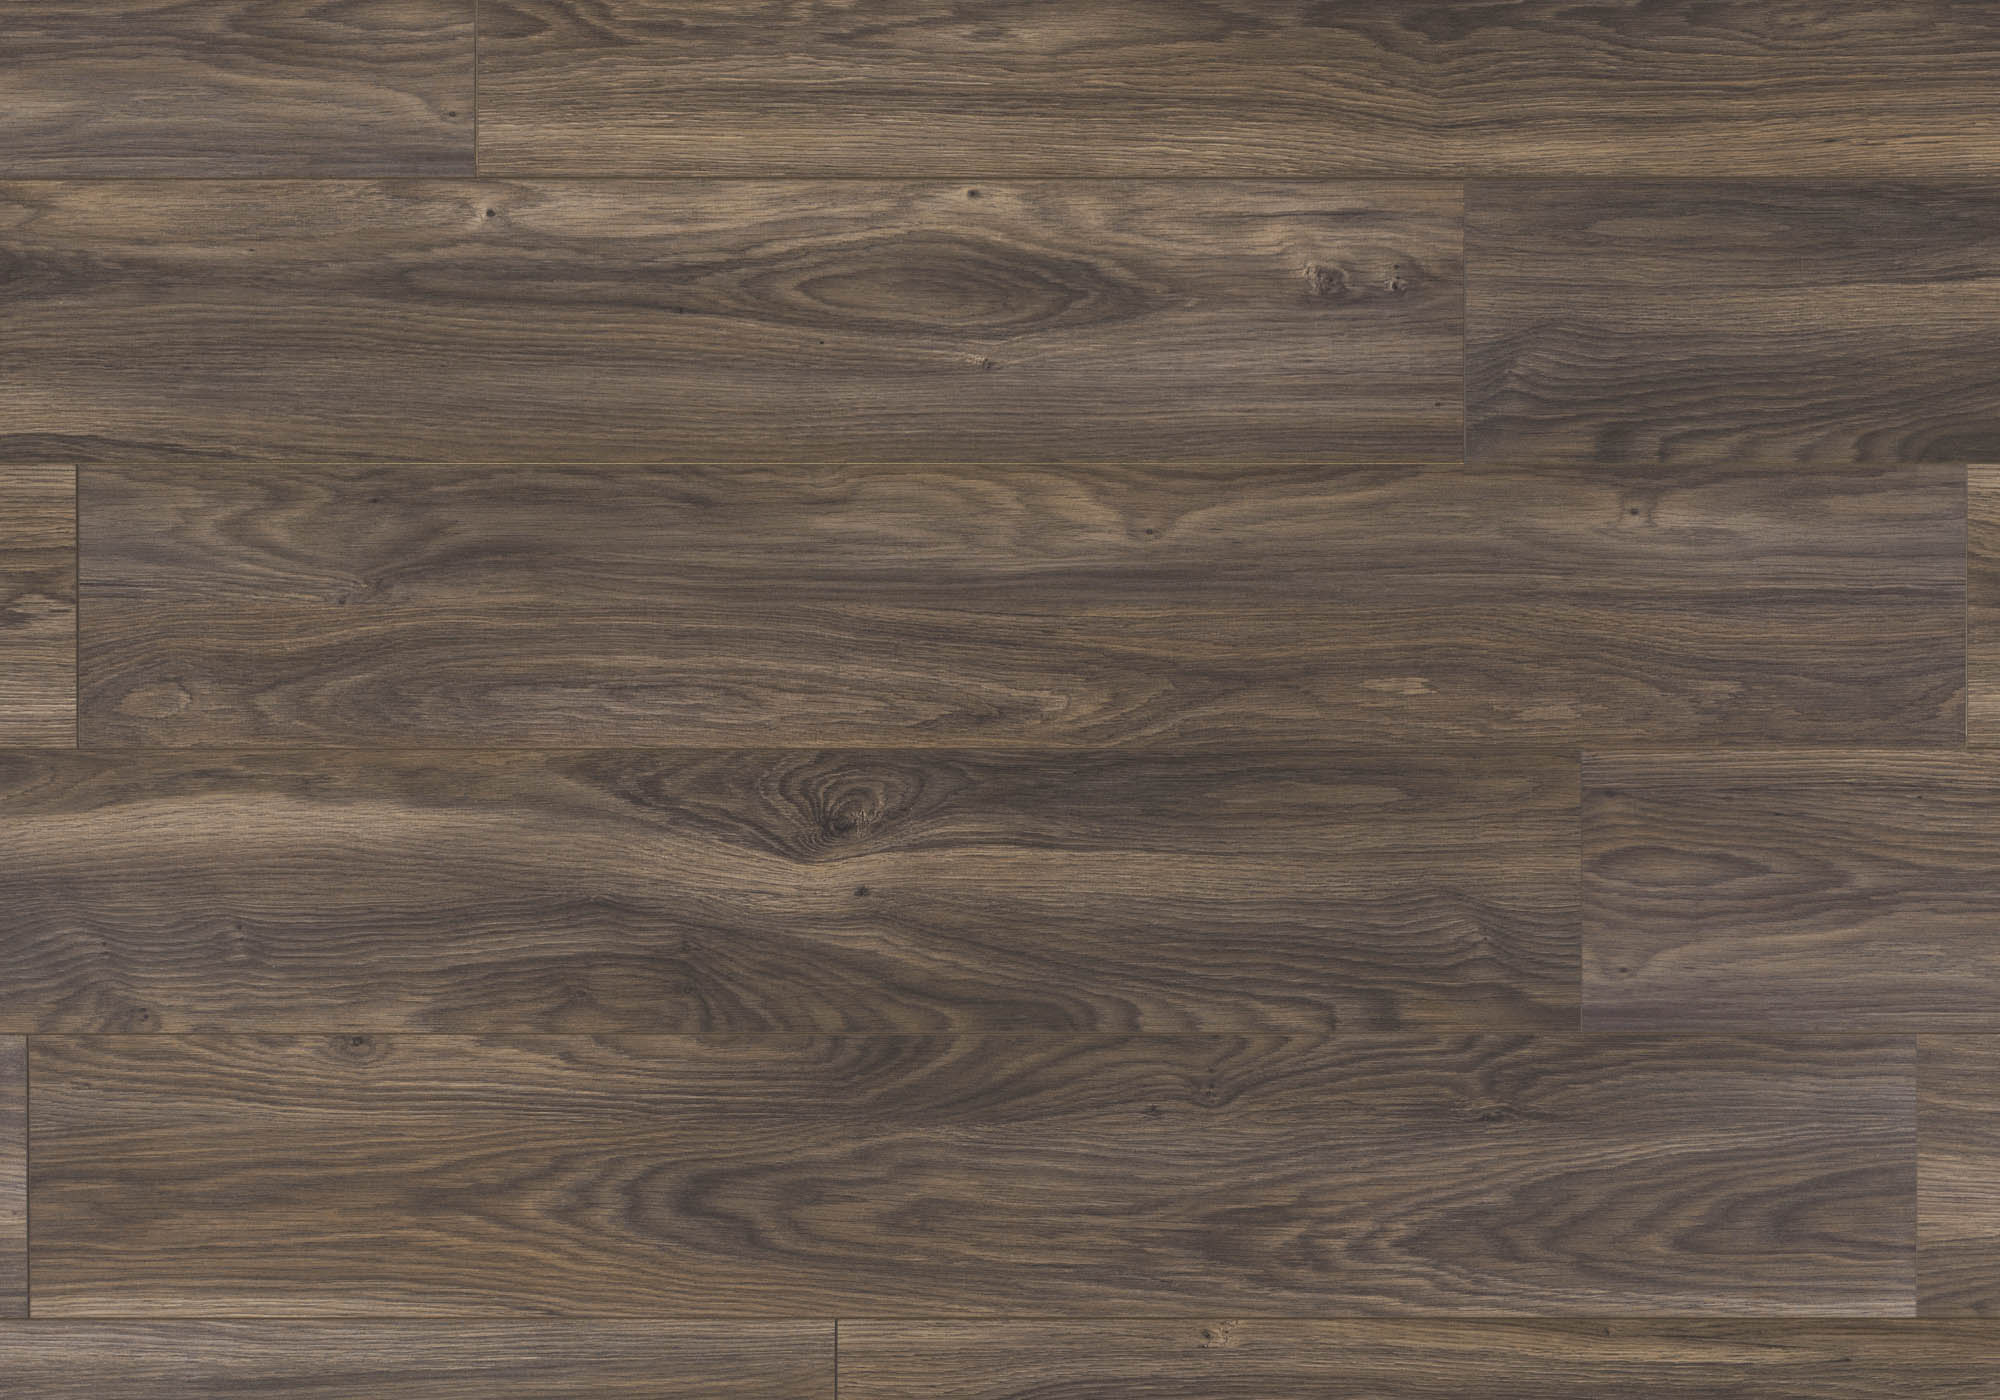 Inhaus Solido Vision 7 64x50 63 Inch, Solido Vision Laminate Flooring